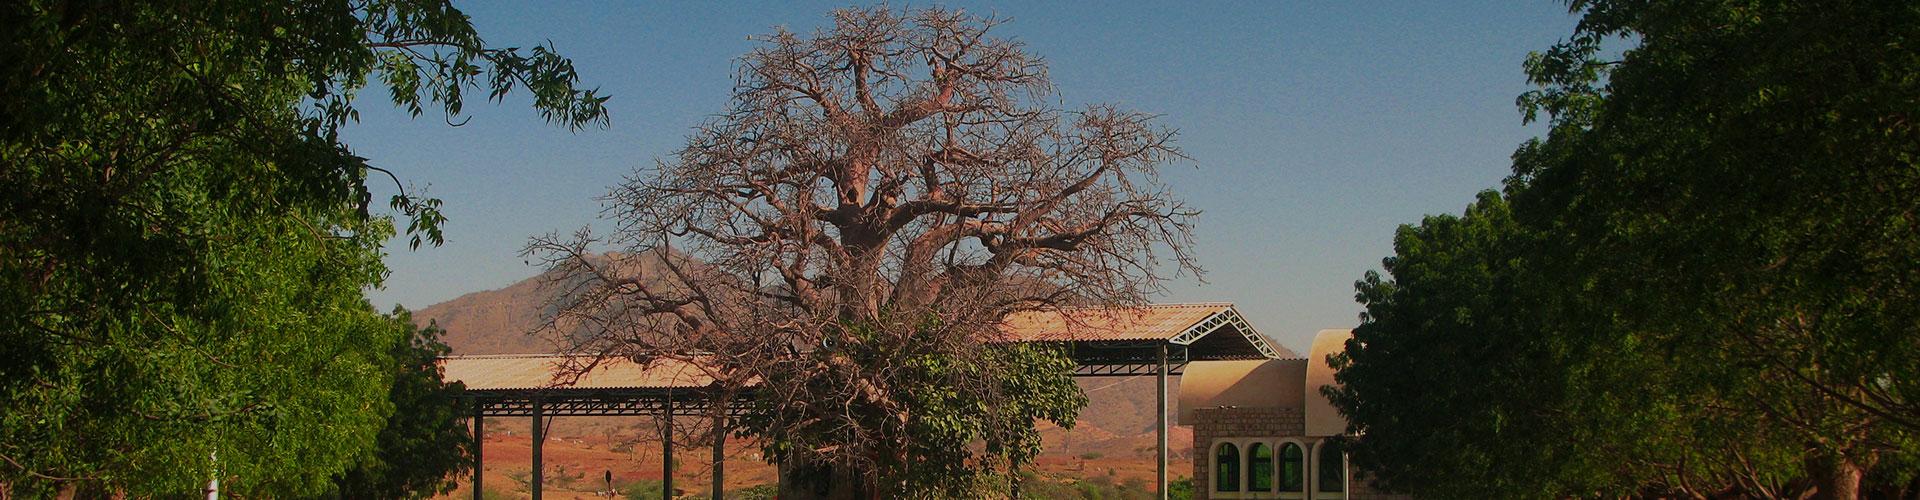 Landmark photograph of Eritrea